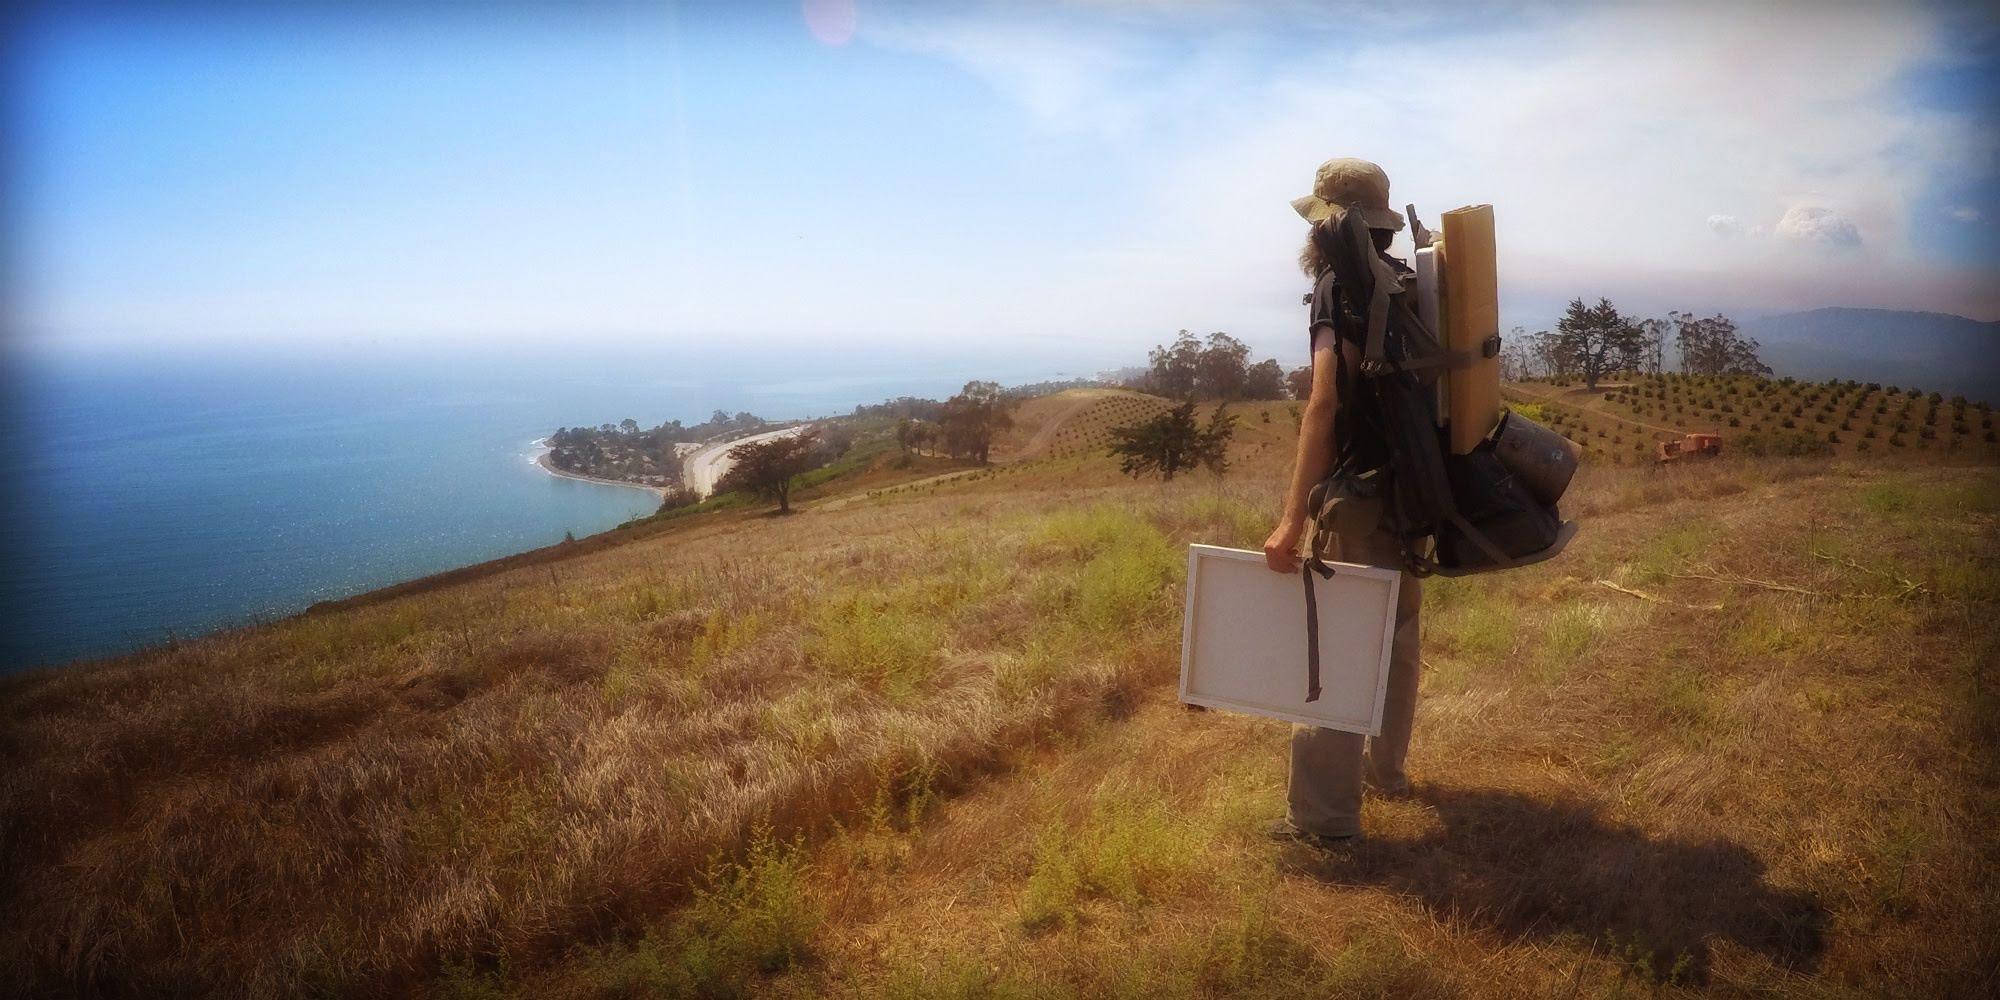 Artist Matt Beard getting ready to paint over Rincon on the California coast